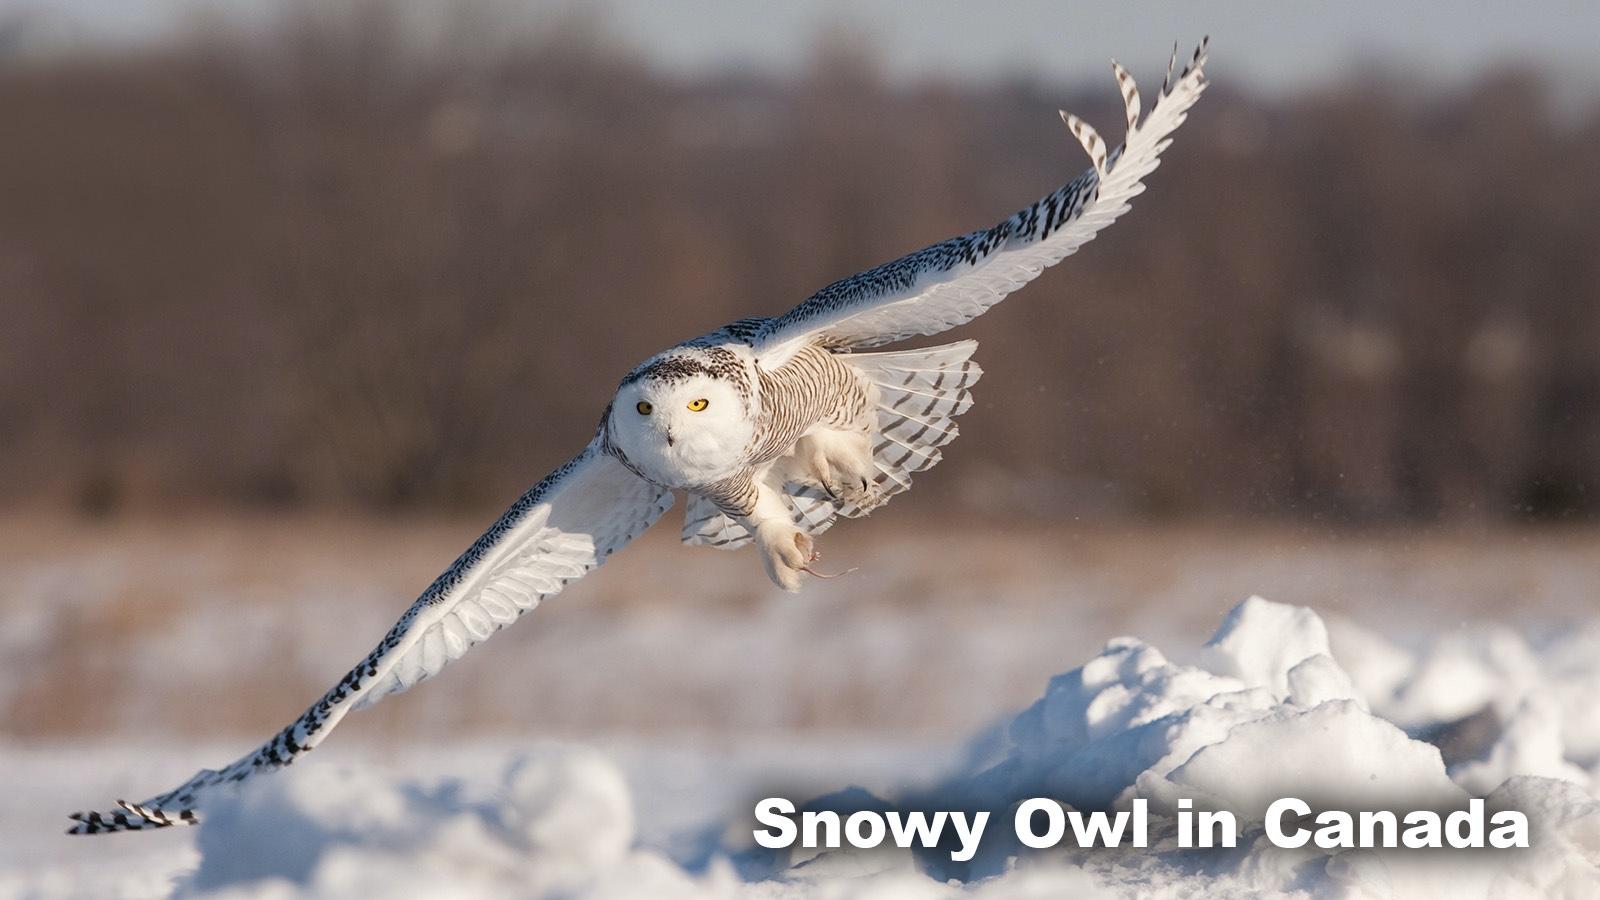 Snowy Owl in Tundra Biome